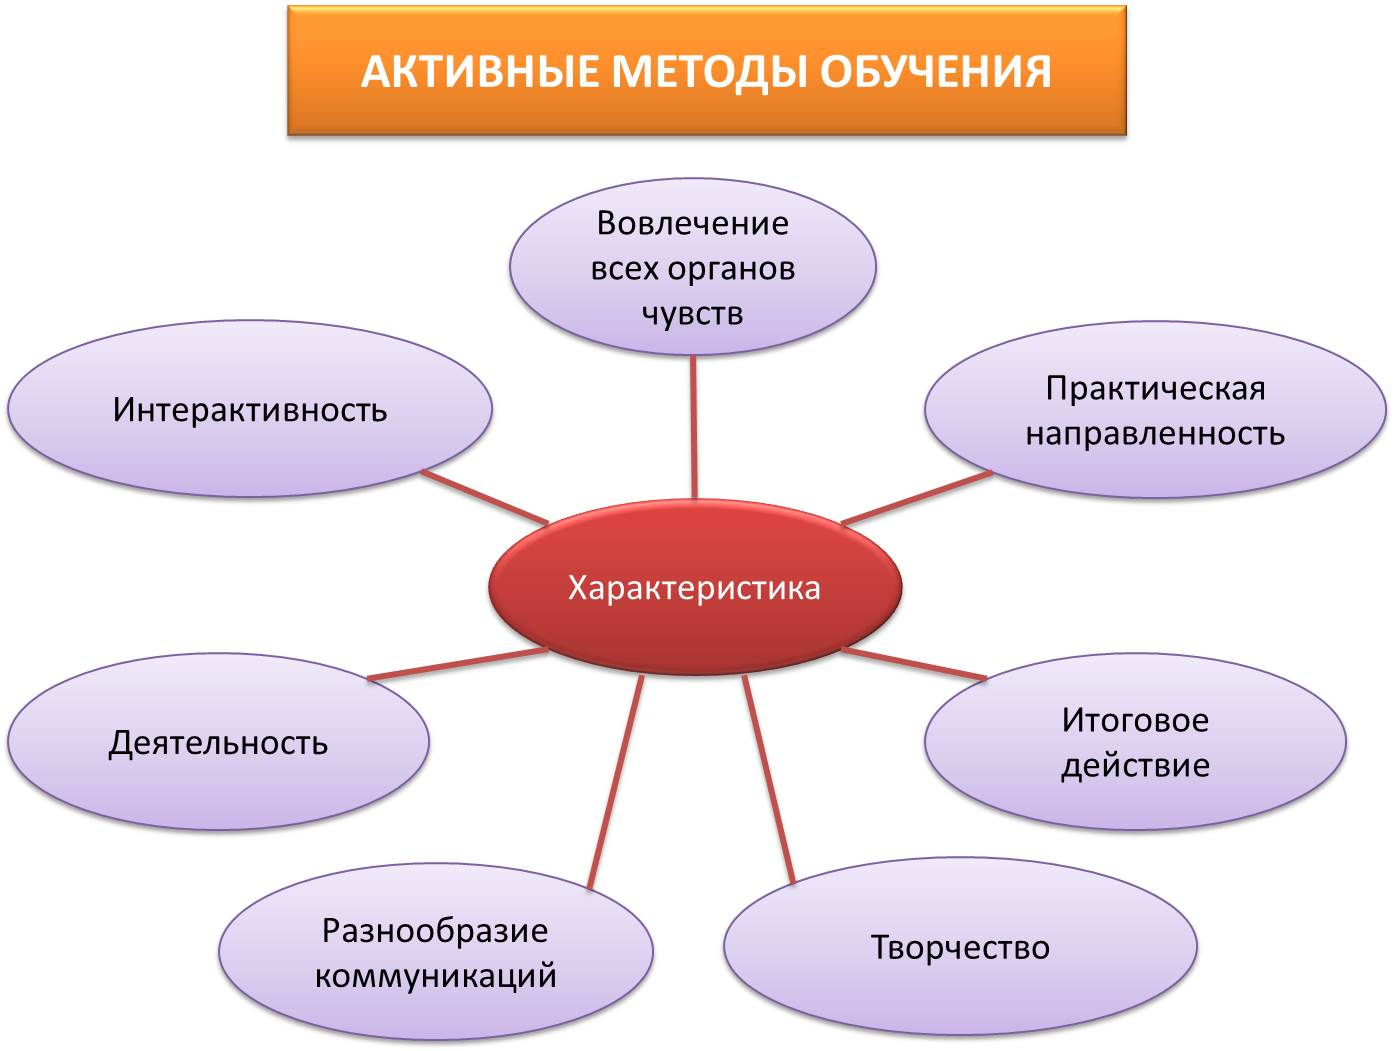 C:\Documents and Settings\User\Мои документы\Загрузки\амо технология.jpg